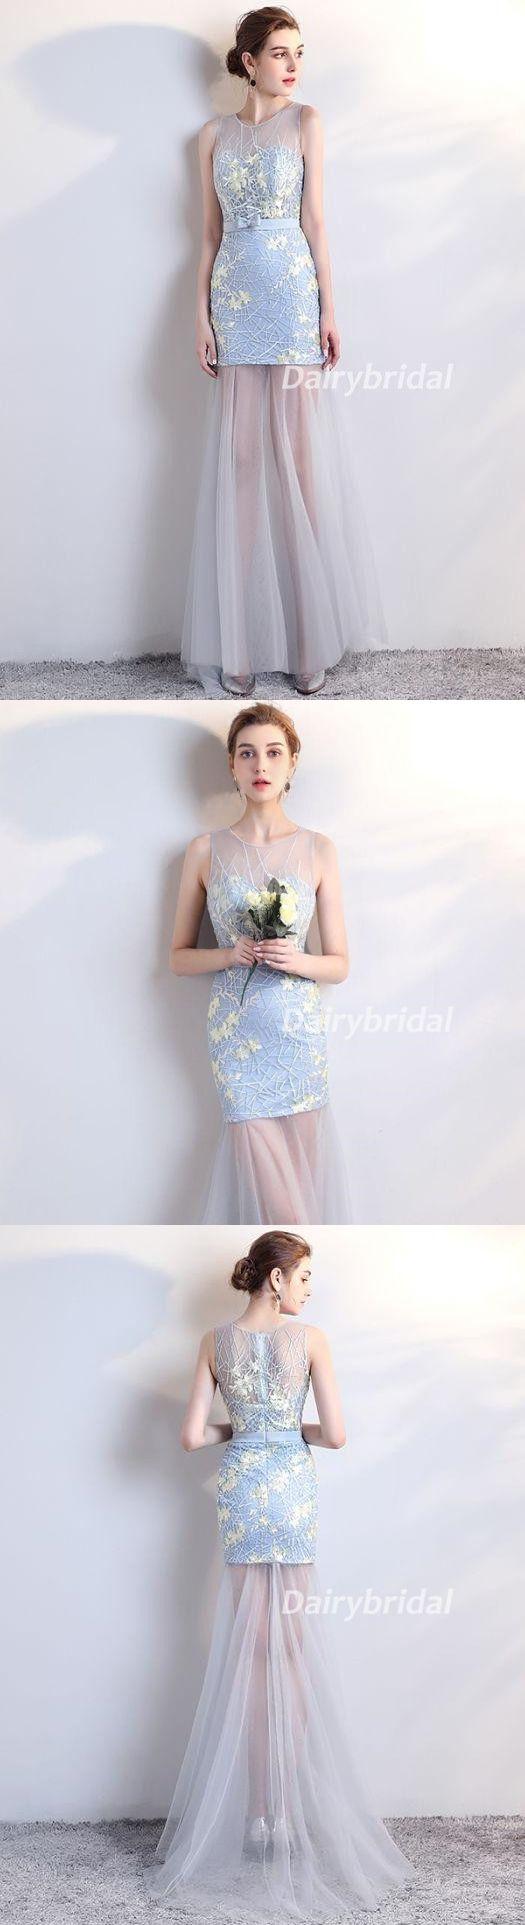 Applique Prom Dresses, Mermaid Prom Dresses, See Through Prom Dresses, Tulle Evening Dresses,DA900 #dairybridal #promdress